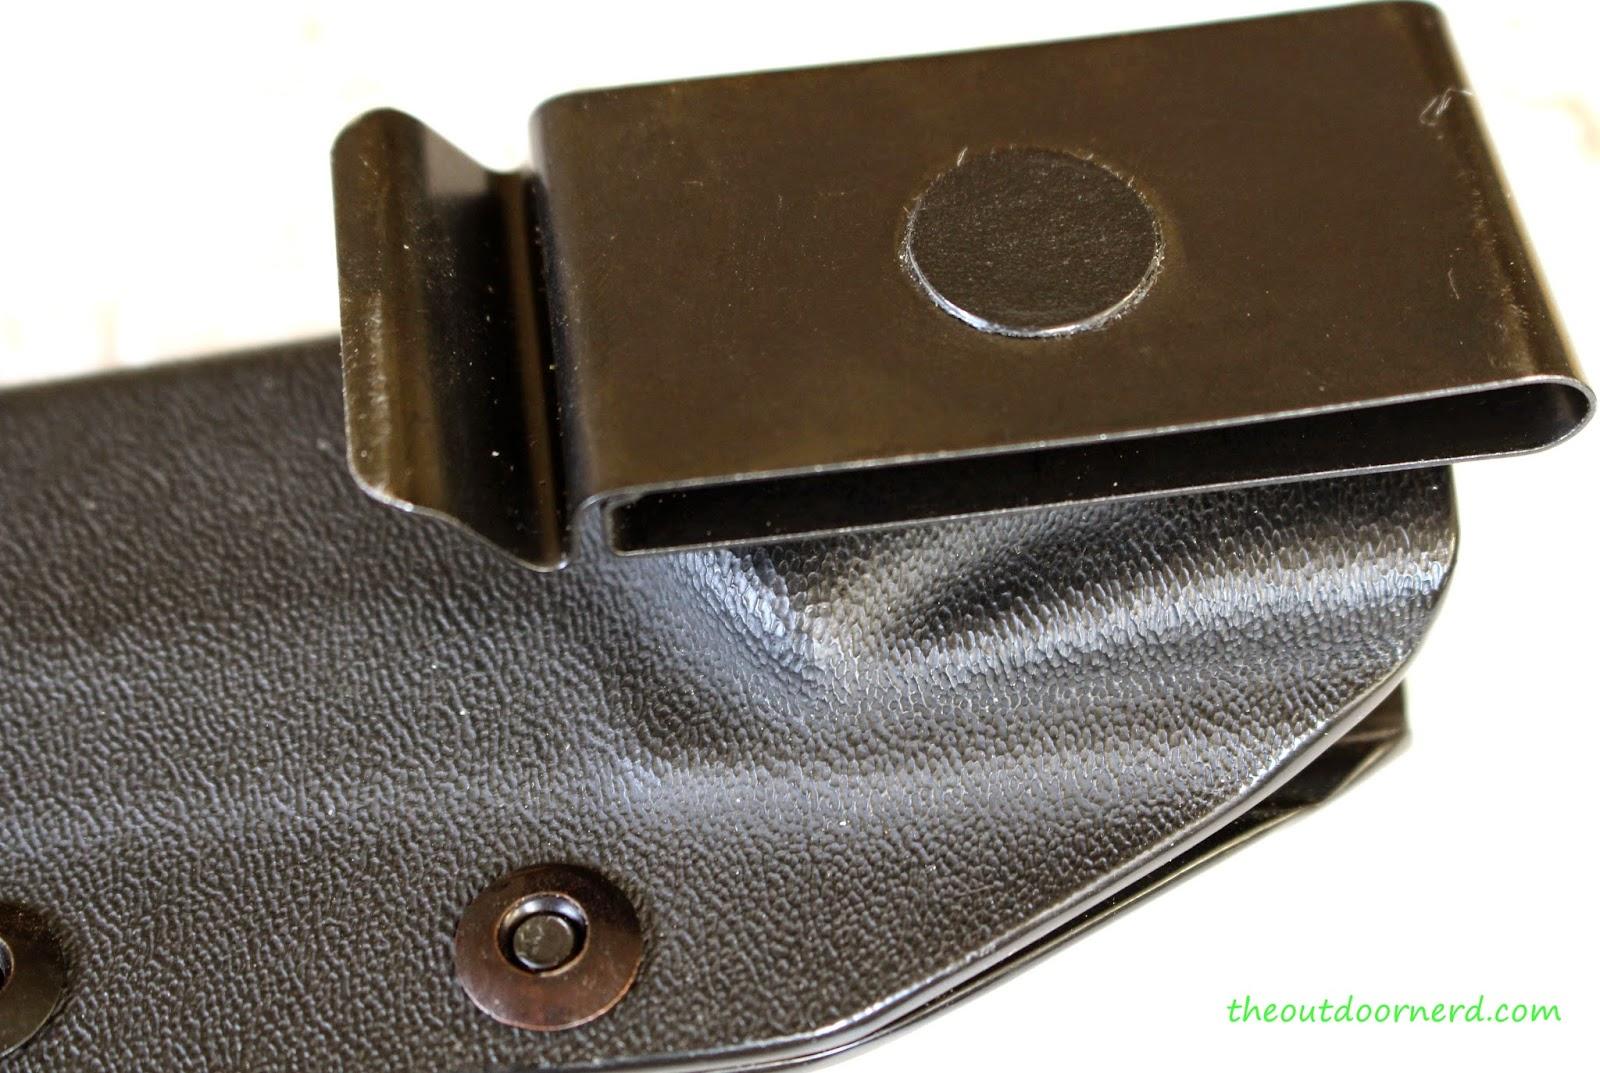 Tops Fieldcraft Fixed Blade Knife: Sheath View 3